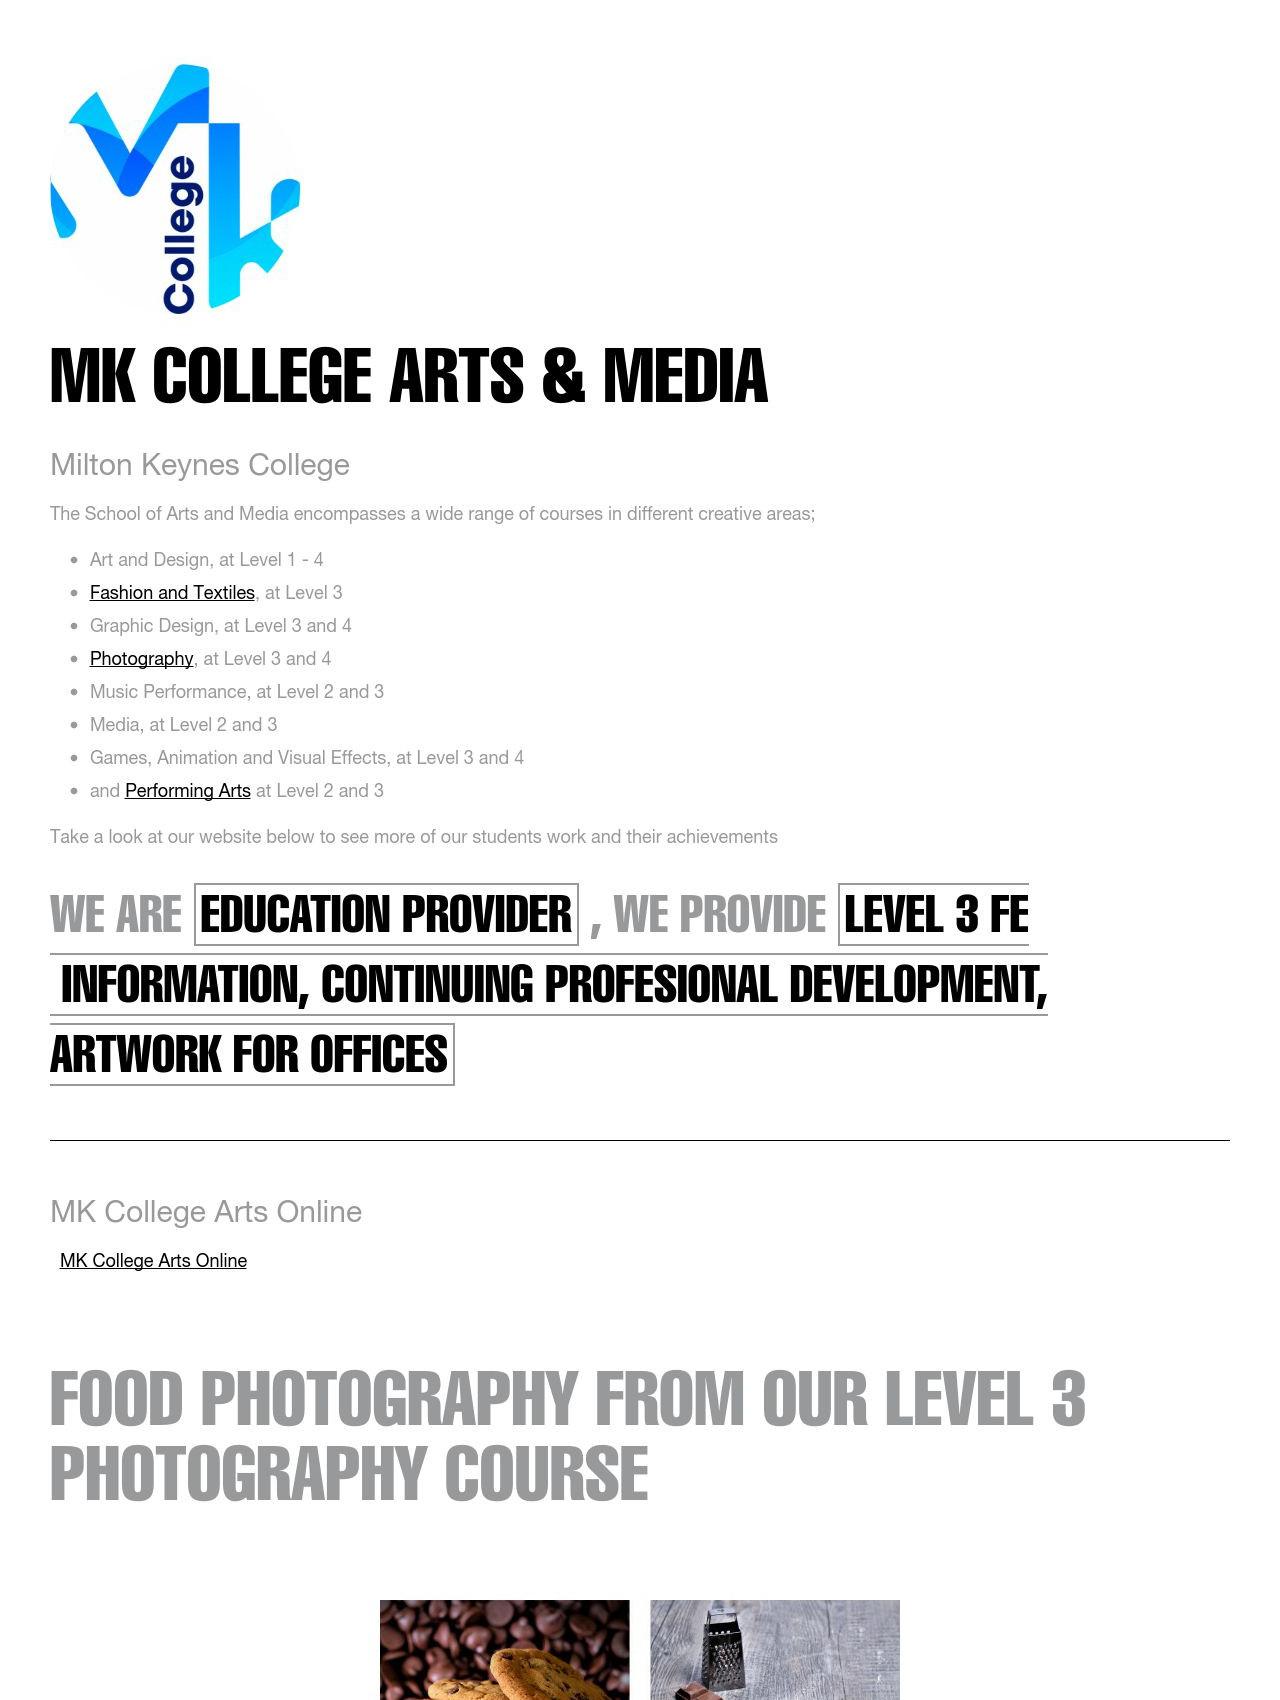 MK College School of Arts and Media